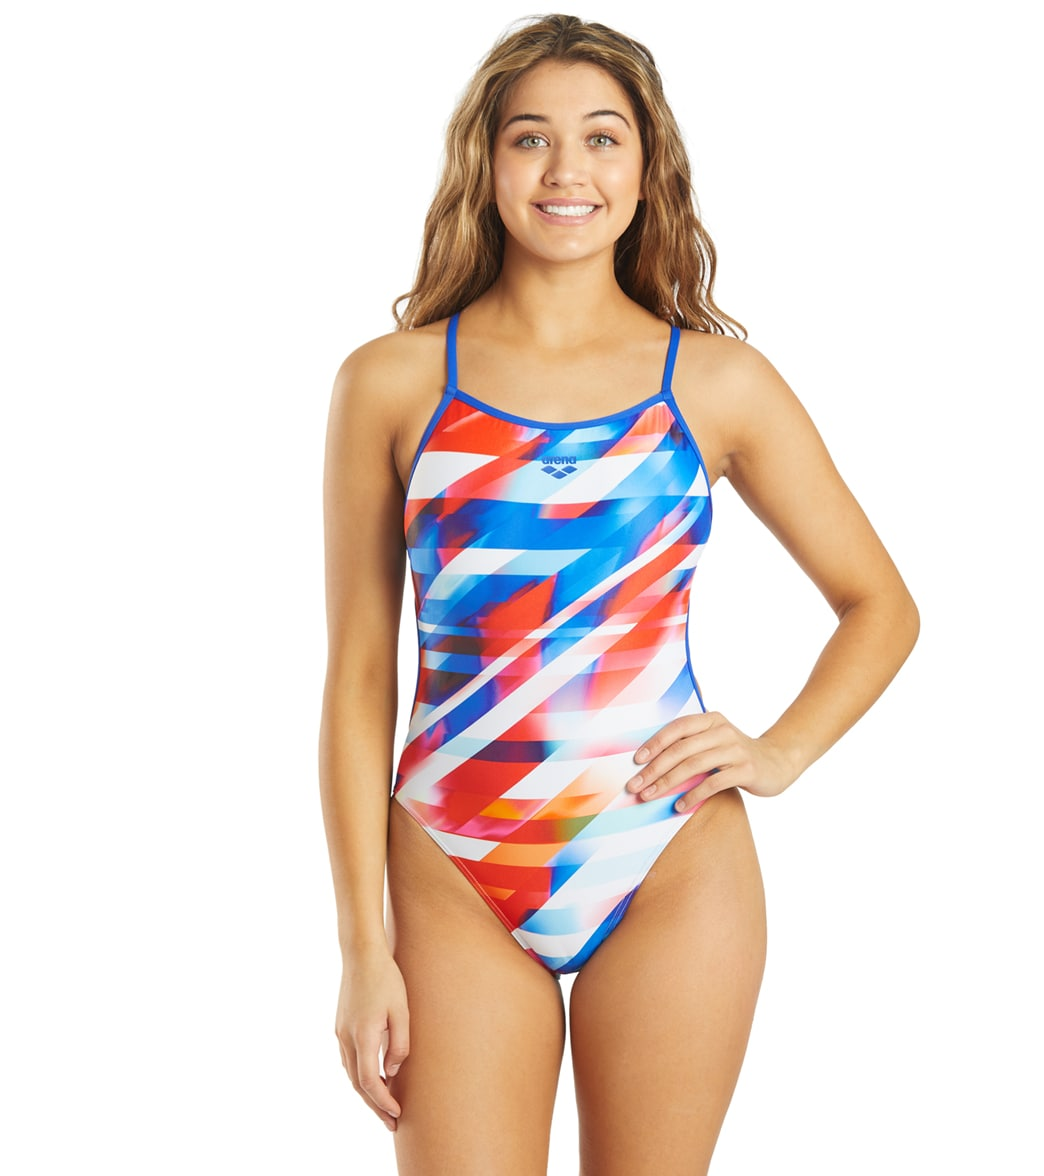 Arena Women's Rainbow Stripes Maxlife Lace Back One Piece Swimsuit